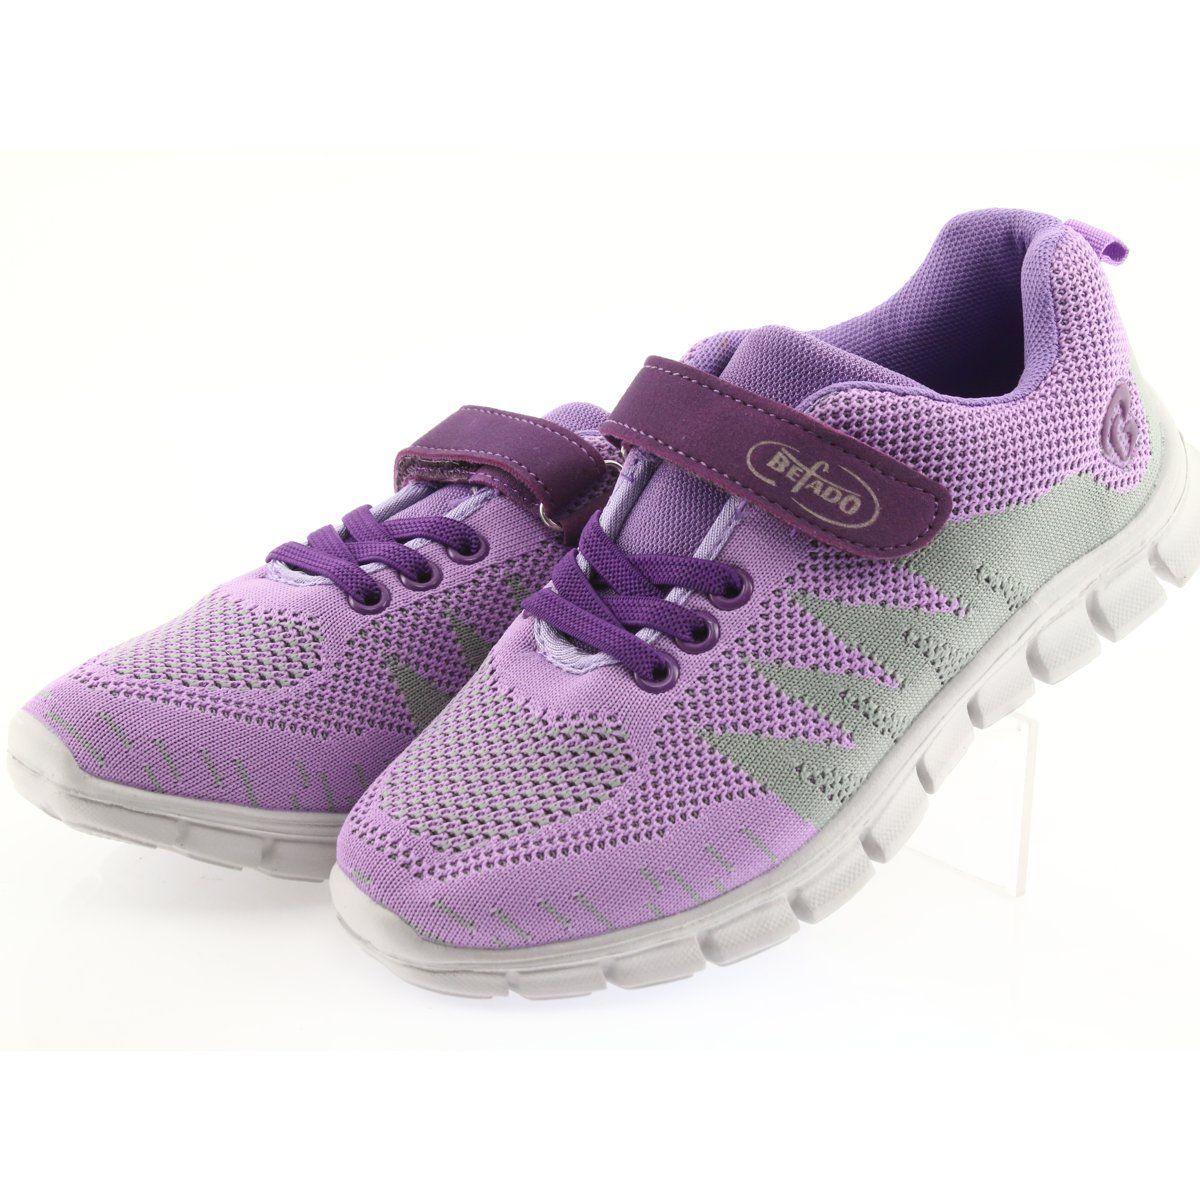 Befado Obuwie Dzieciece Do 23 Cm 516y025 Fioletowe Childrens Shoes Kid Shoes Shoes